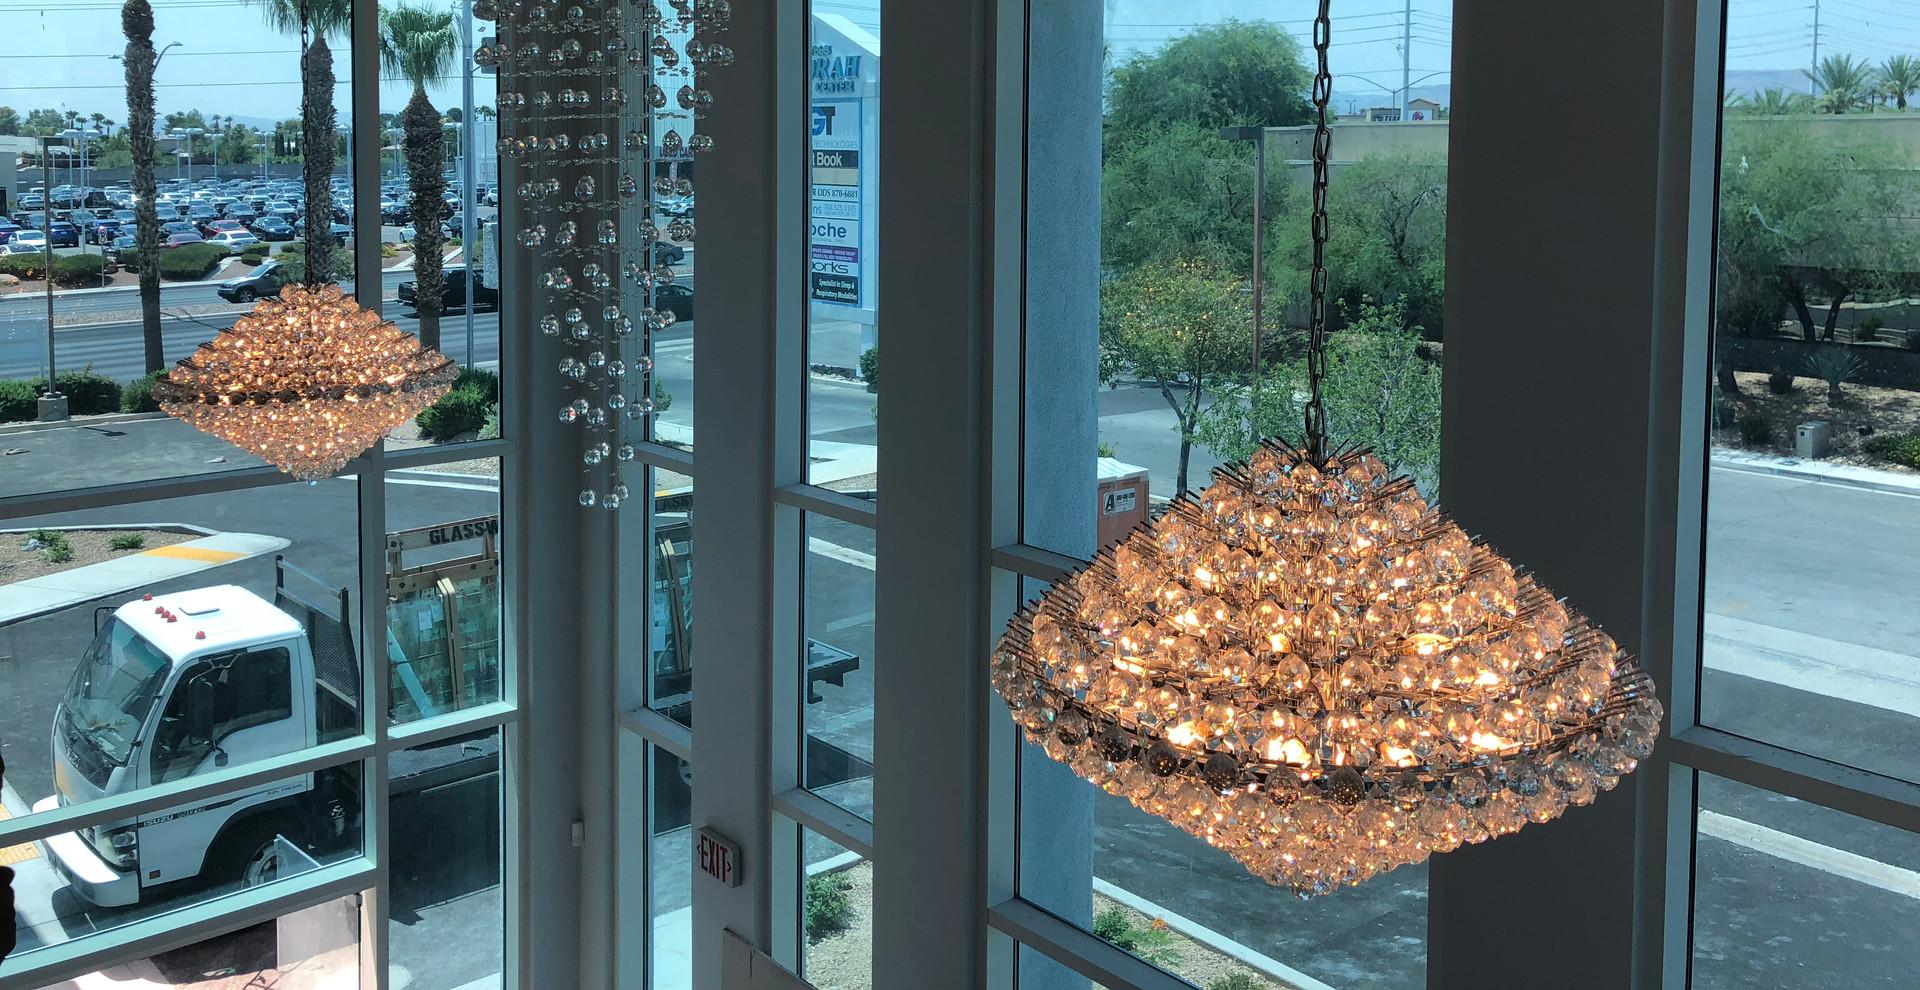 LUXURY & ELEGANCE Las Vegas - Intrepid Metal Works Inc.